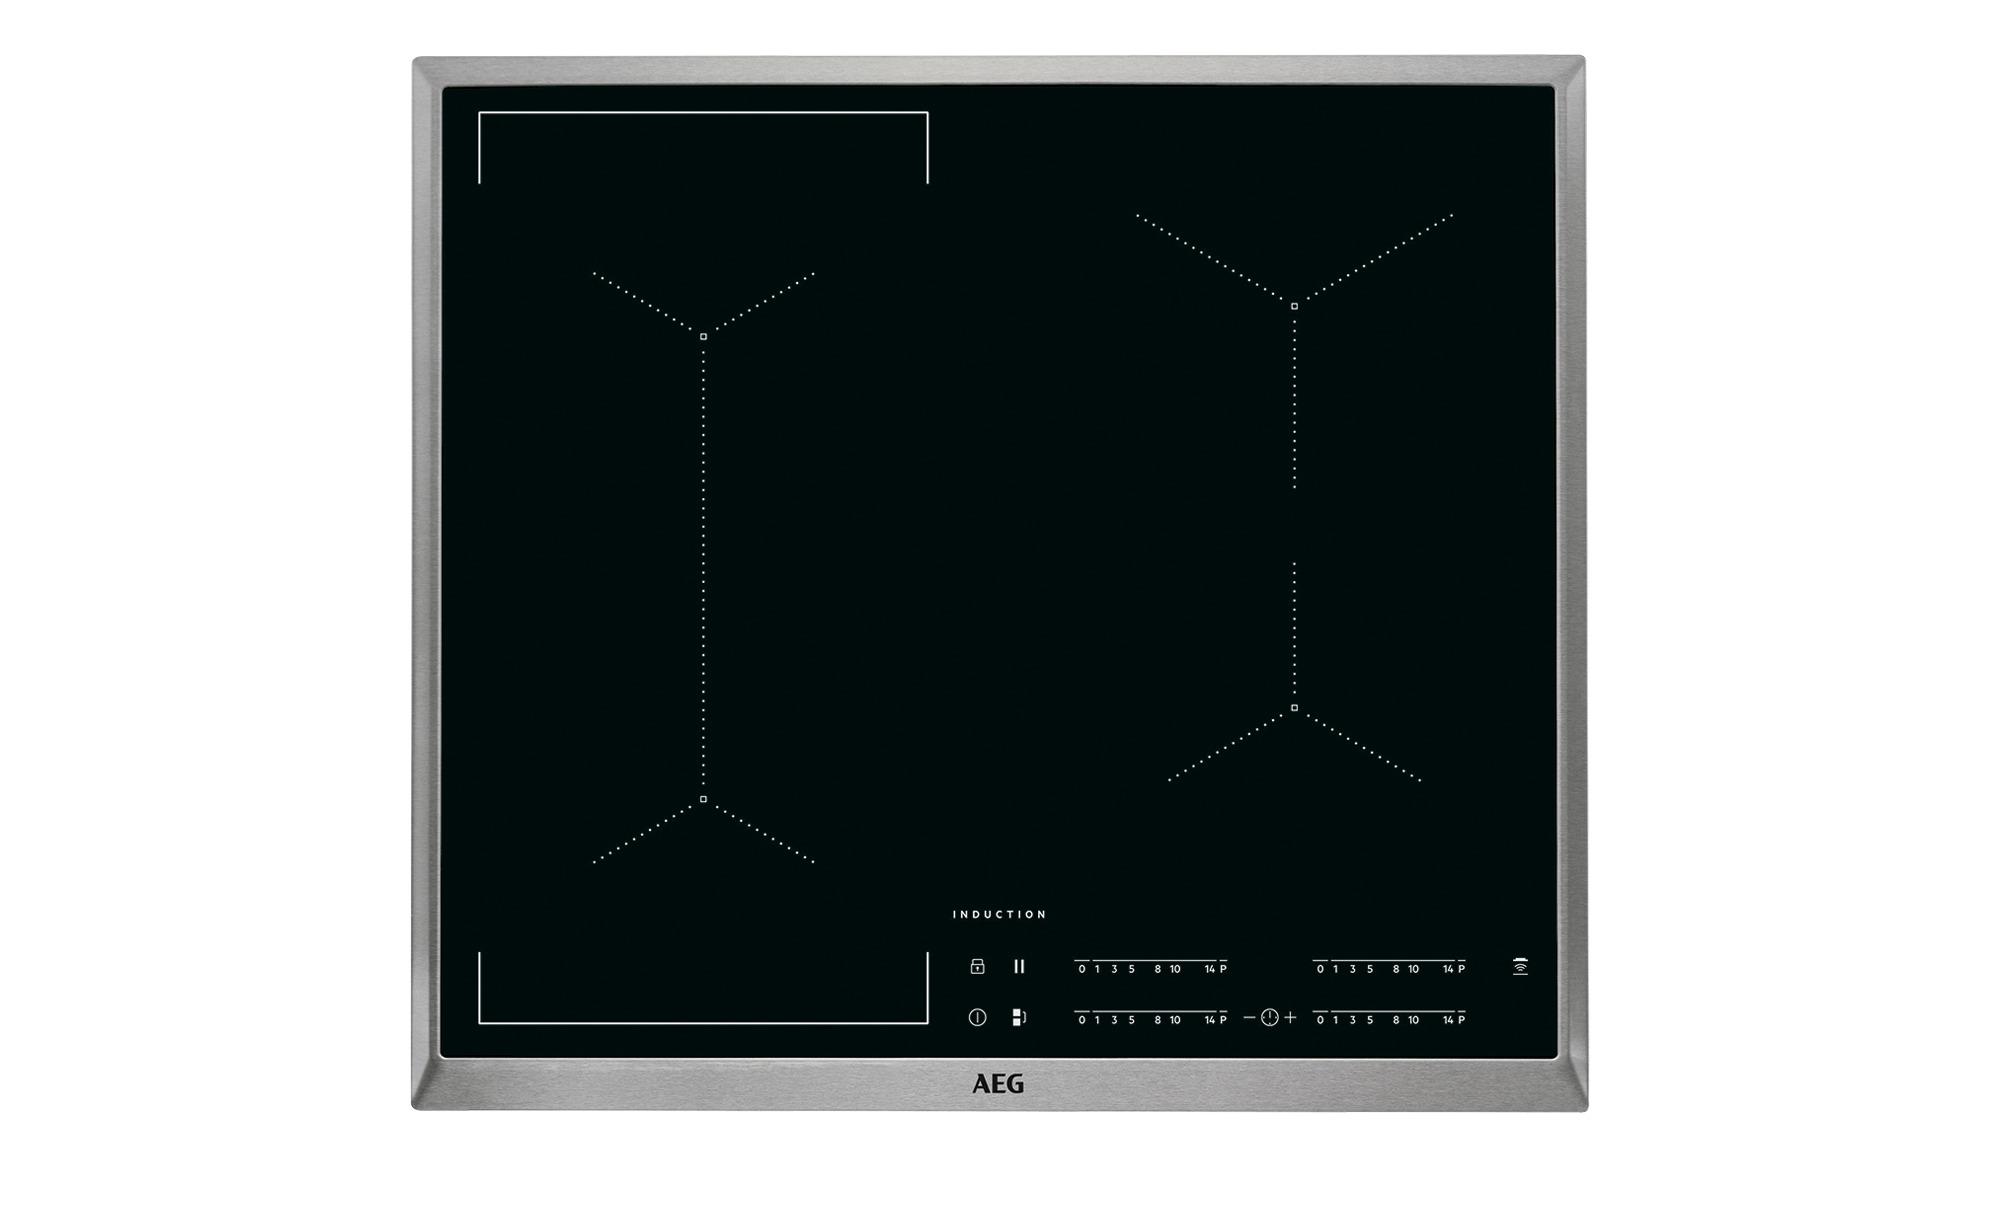 Aeg Kühlschrank Pappe Hinten : Aeg induktions kochstelle ike64441xb möbel höffner